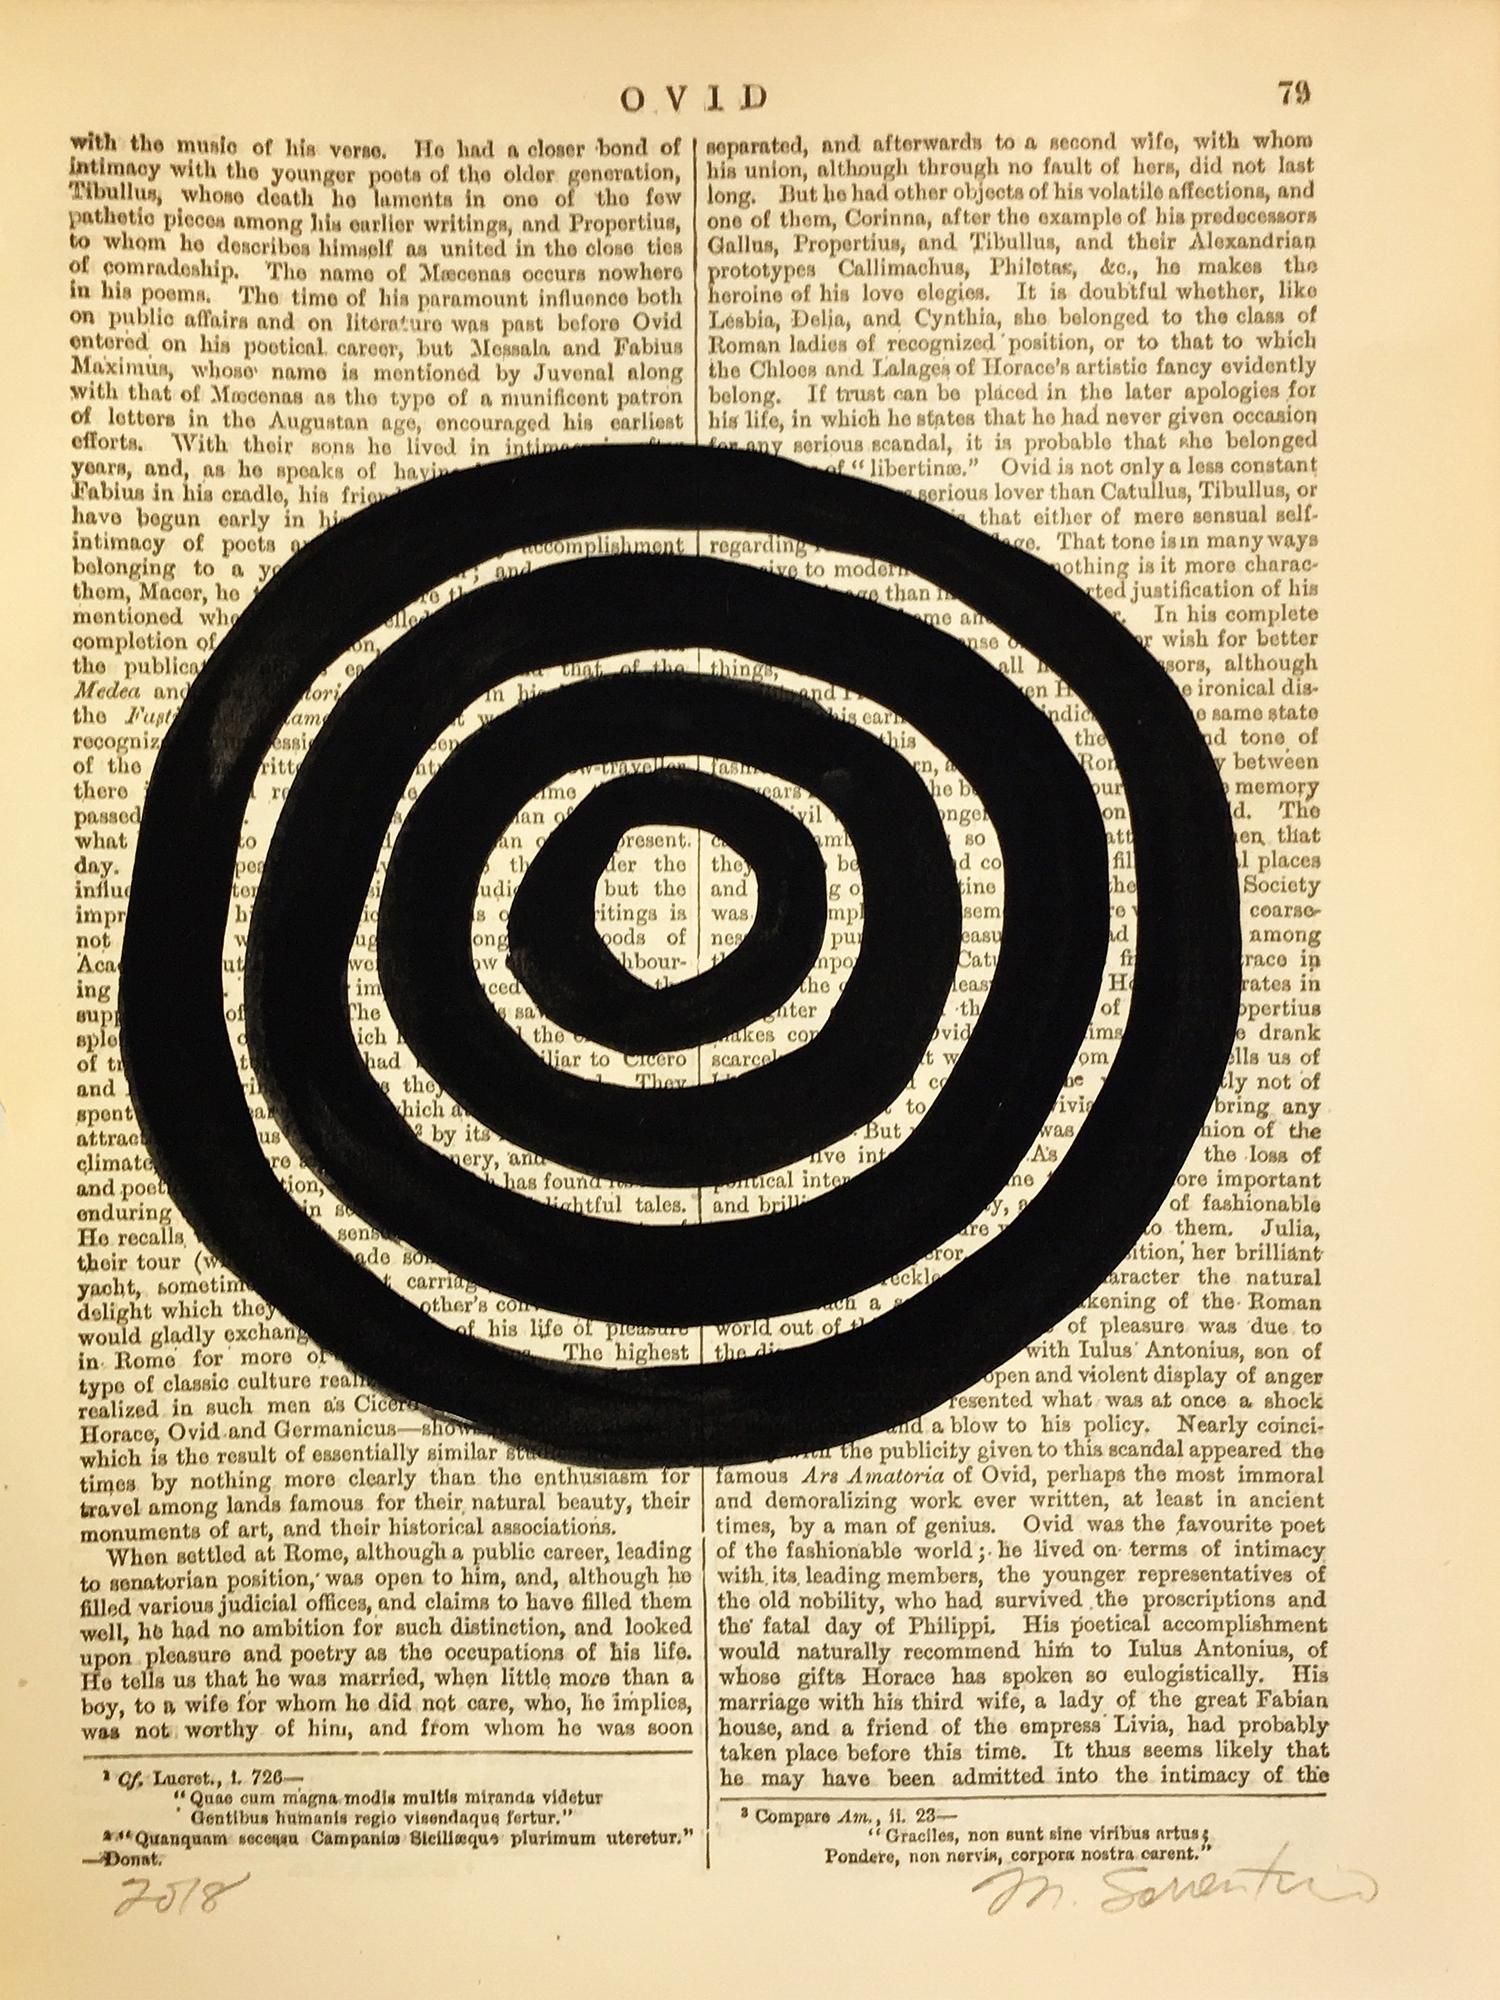 Ovid Black 79  by Michela Sorrentino